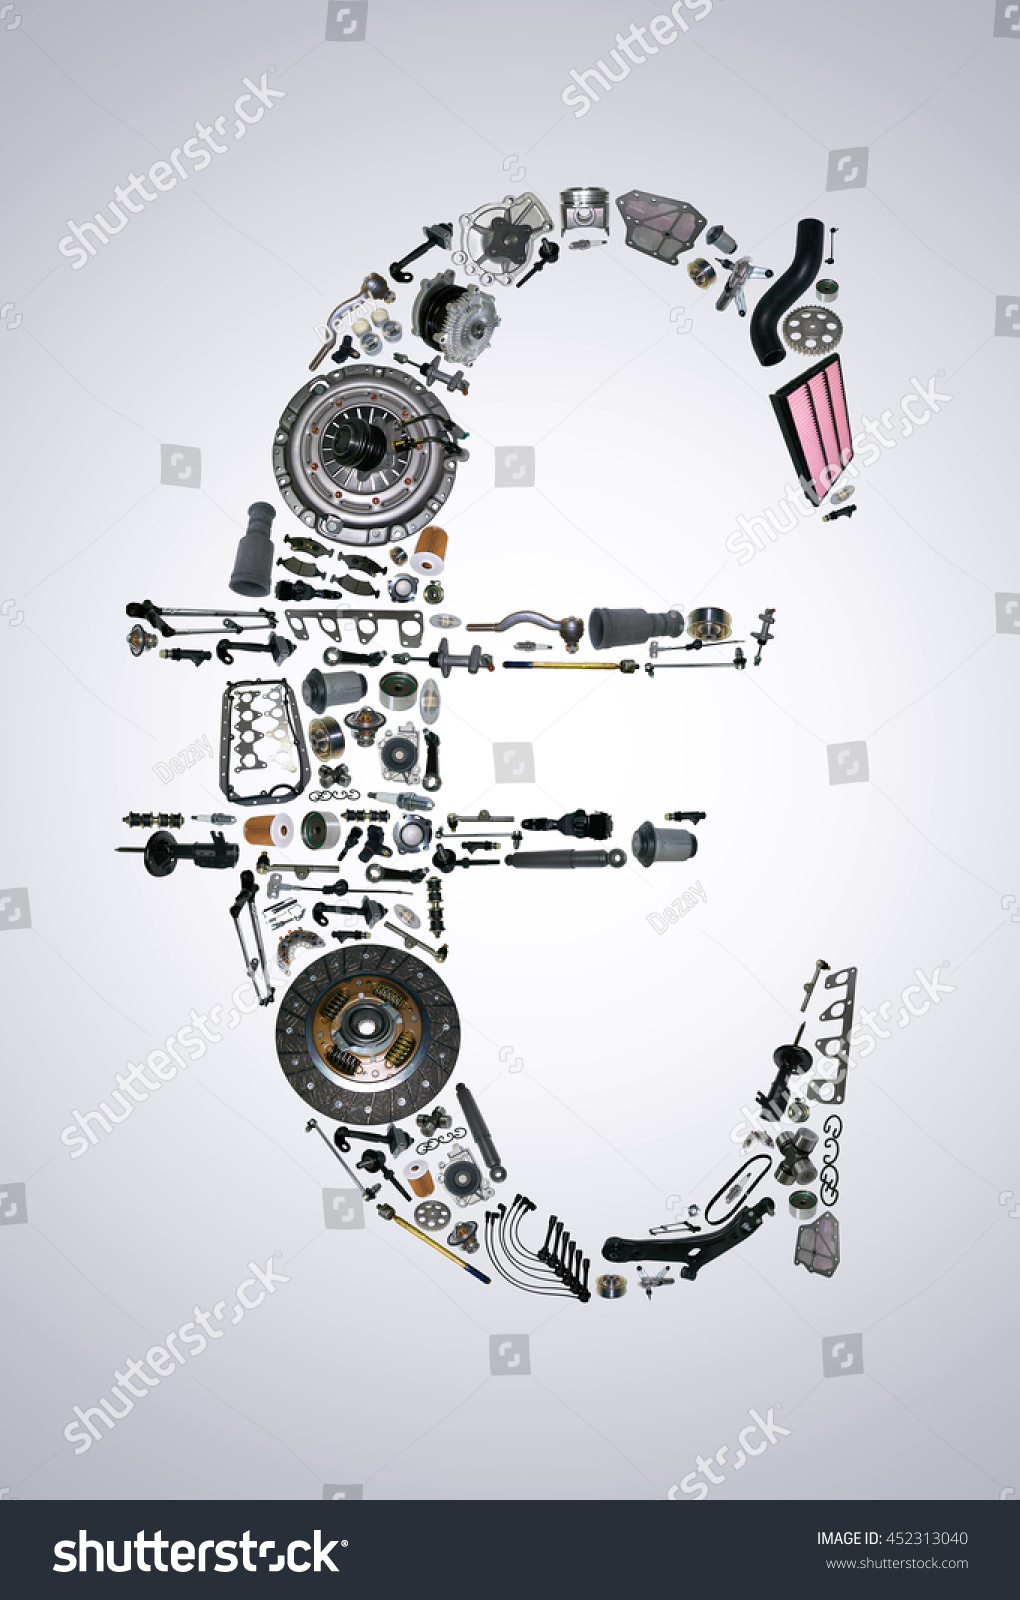 Euro Money Auto Parts Car Spare Stock Photo 452313040 - Shutterstock